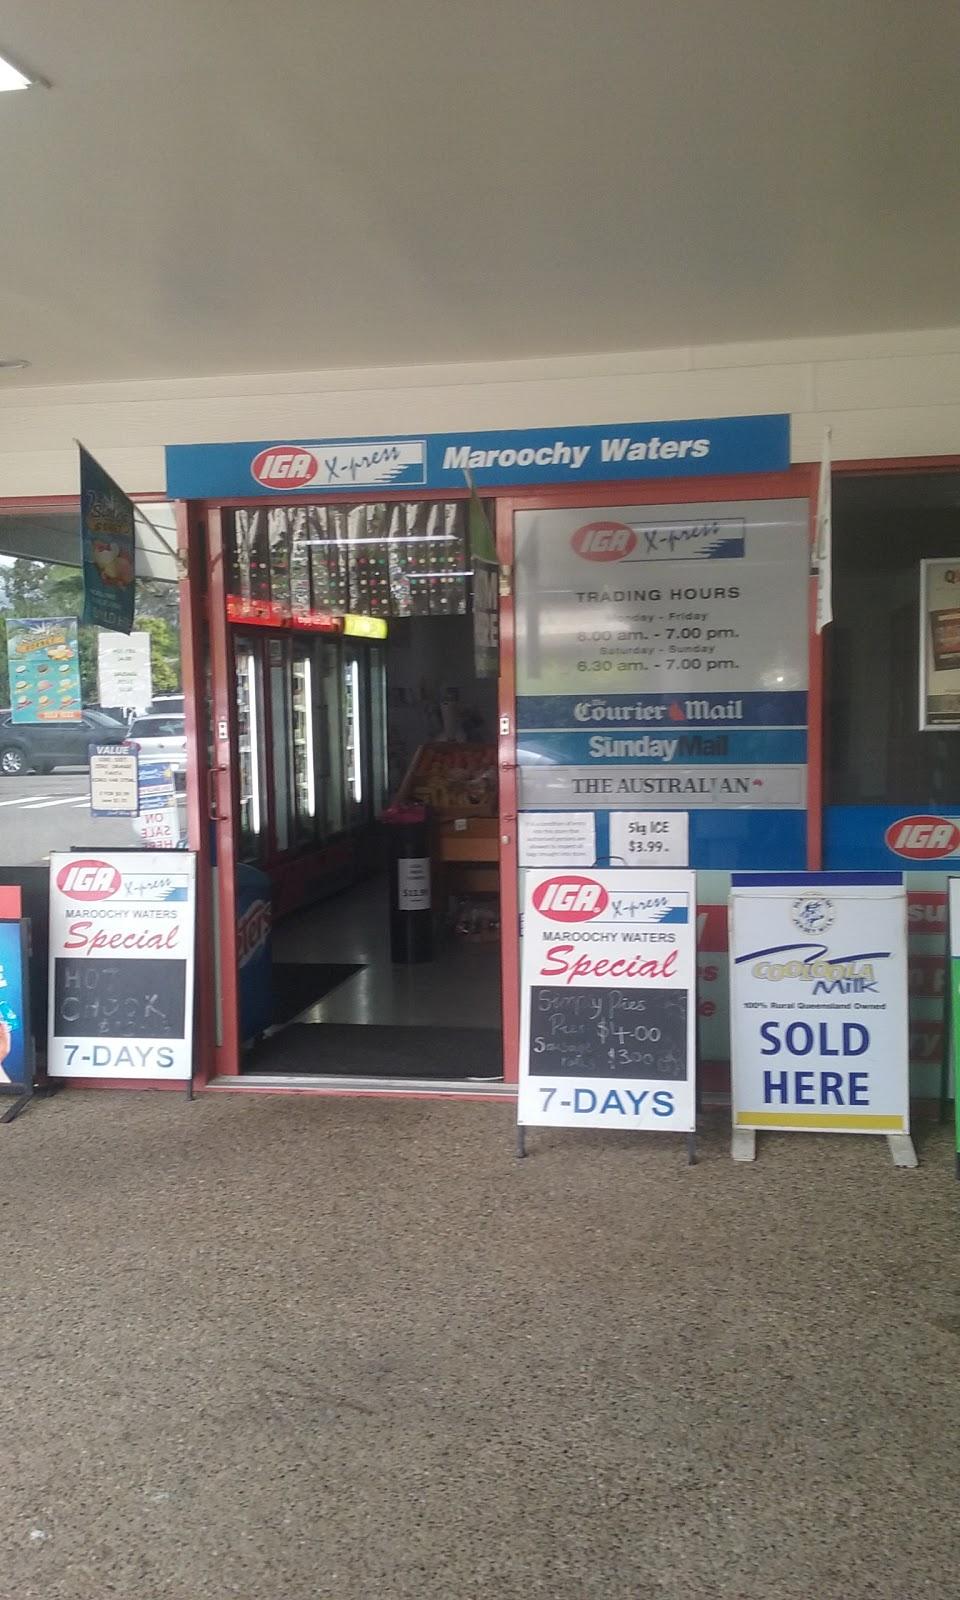 IGA X-press | supermarket | 6 Denna St, Maroochydore QLD 4740, Australia | 0754793732 OR +61 7 5479 3732